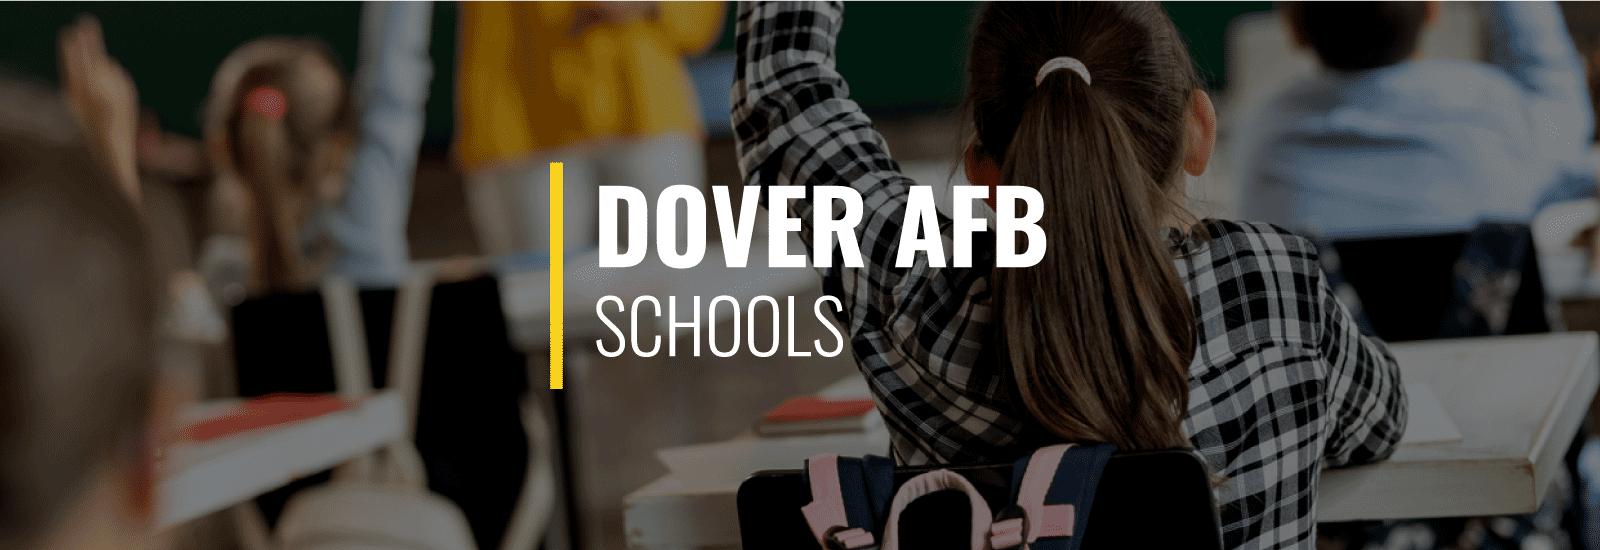 Dover AFB Schools